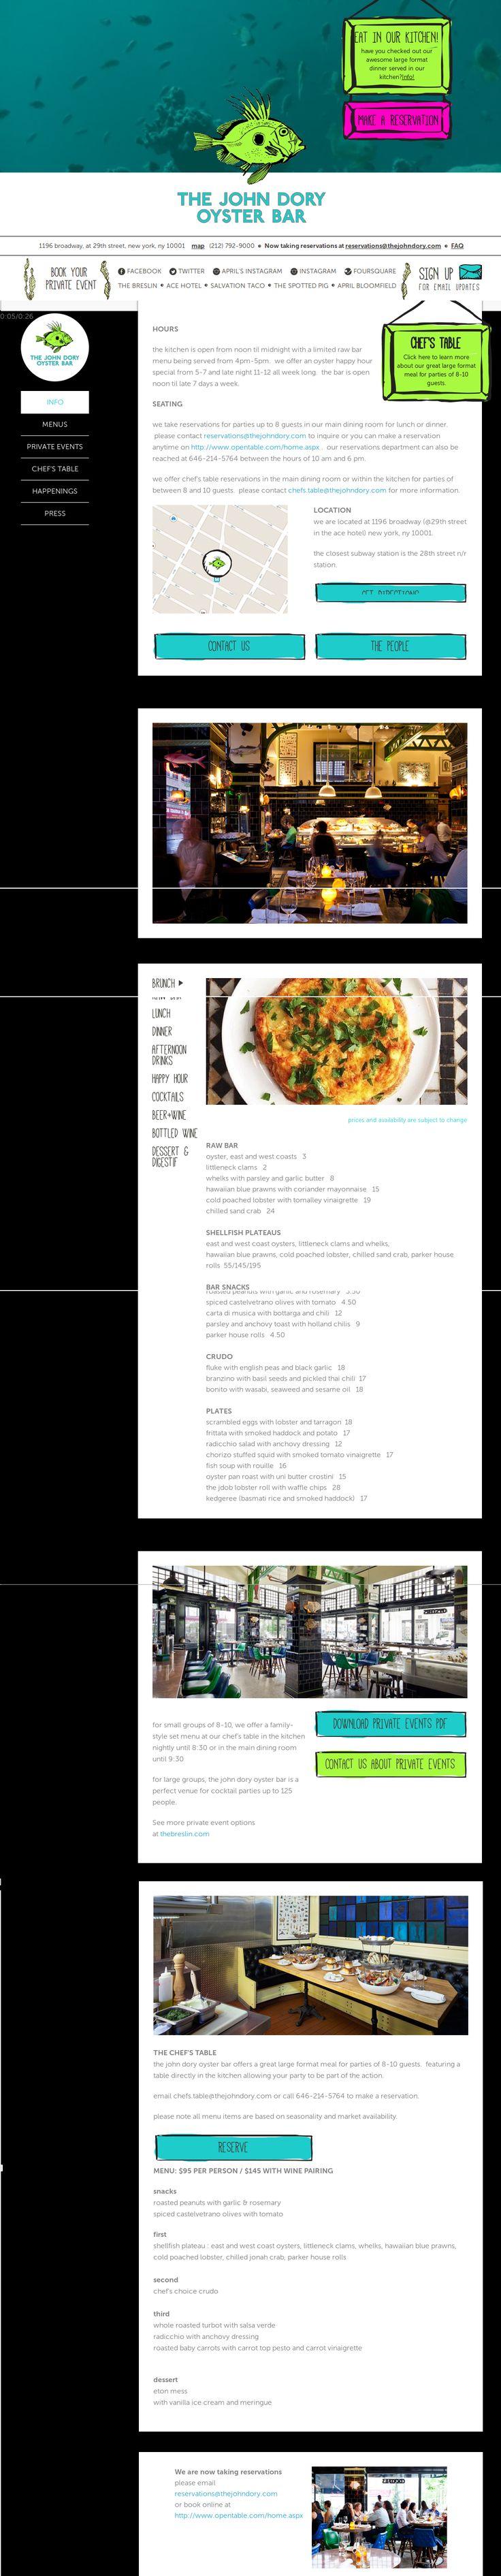 the John Dory - food - #bottom-menu #onepage #map #illustration // #green #pink